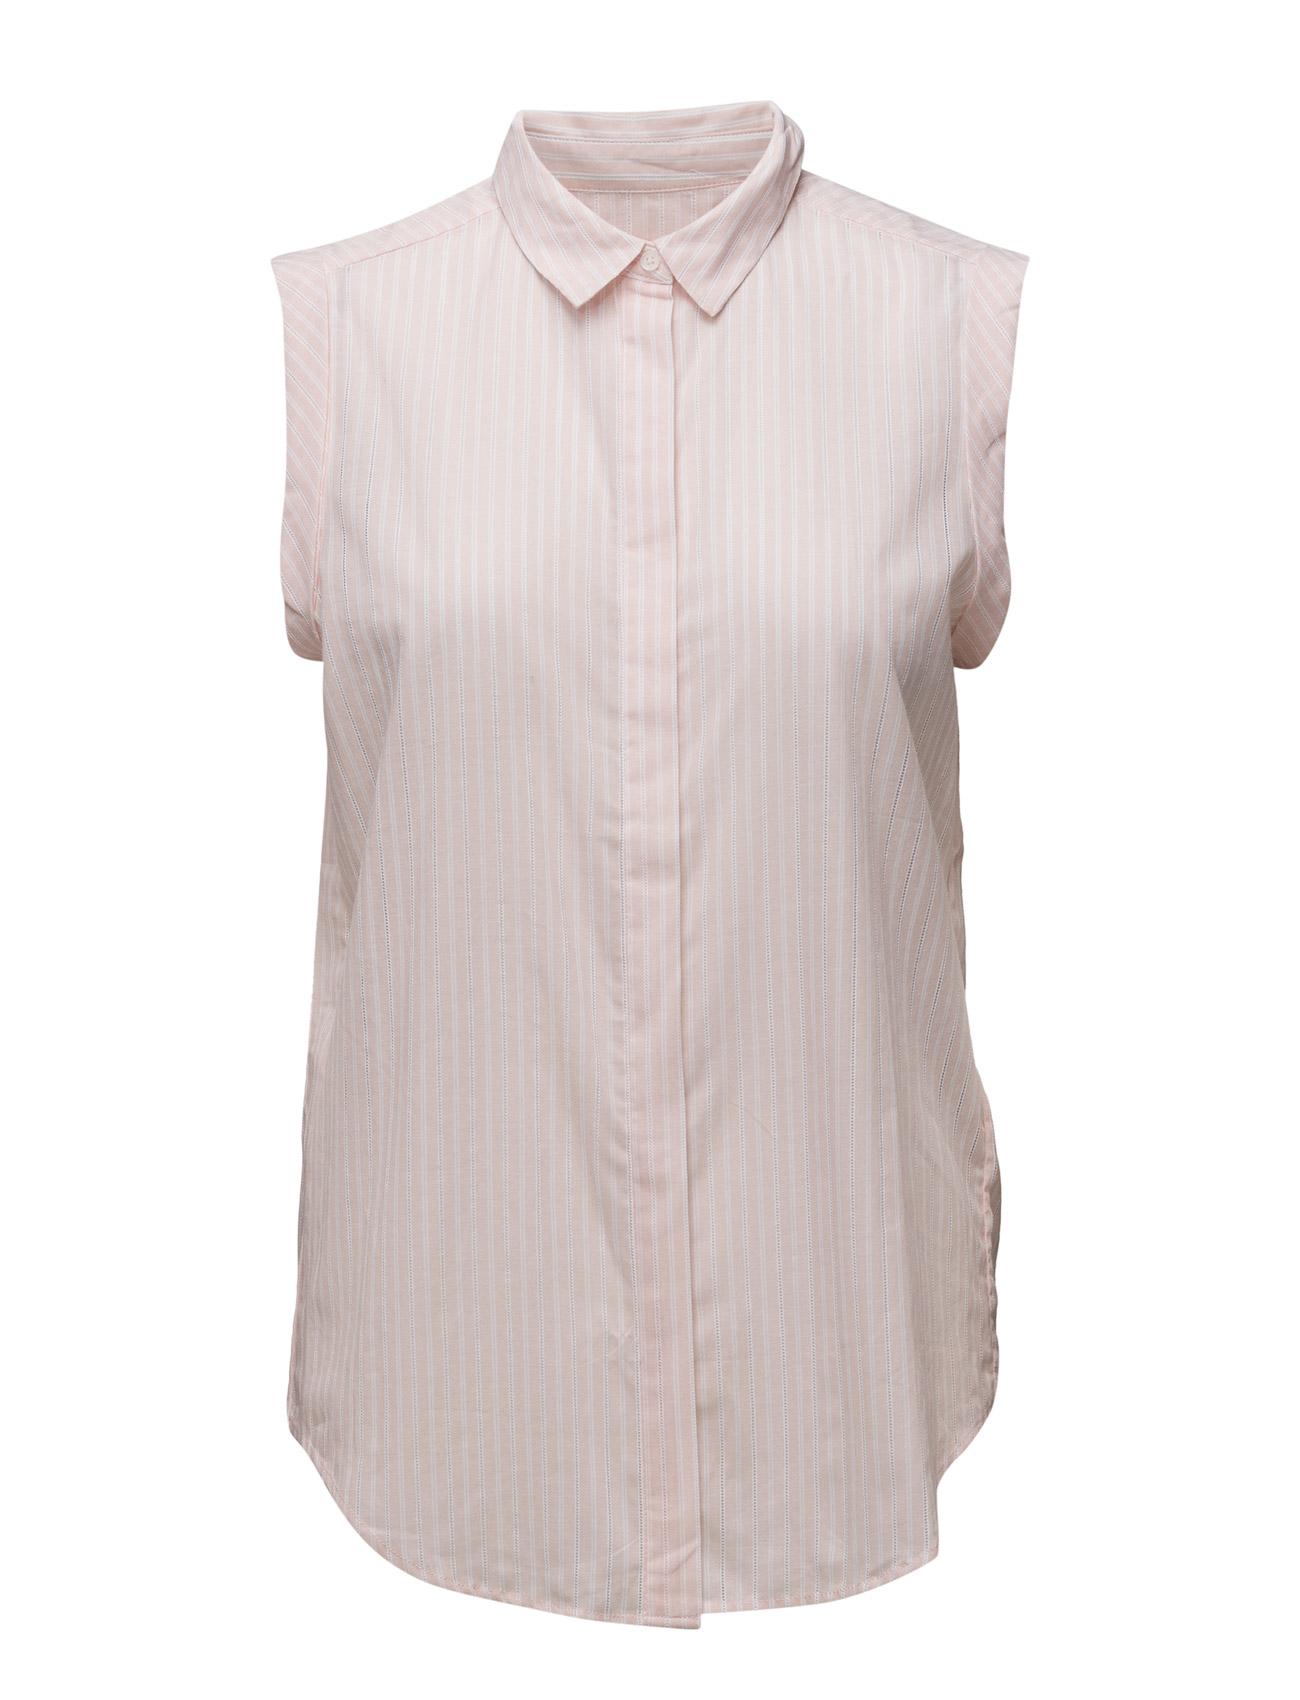 Bay Shirt Lw InWear Ærmeløse til Damer i